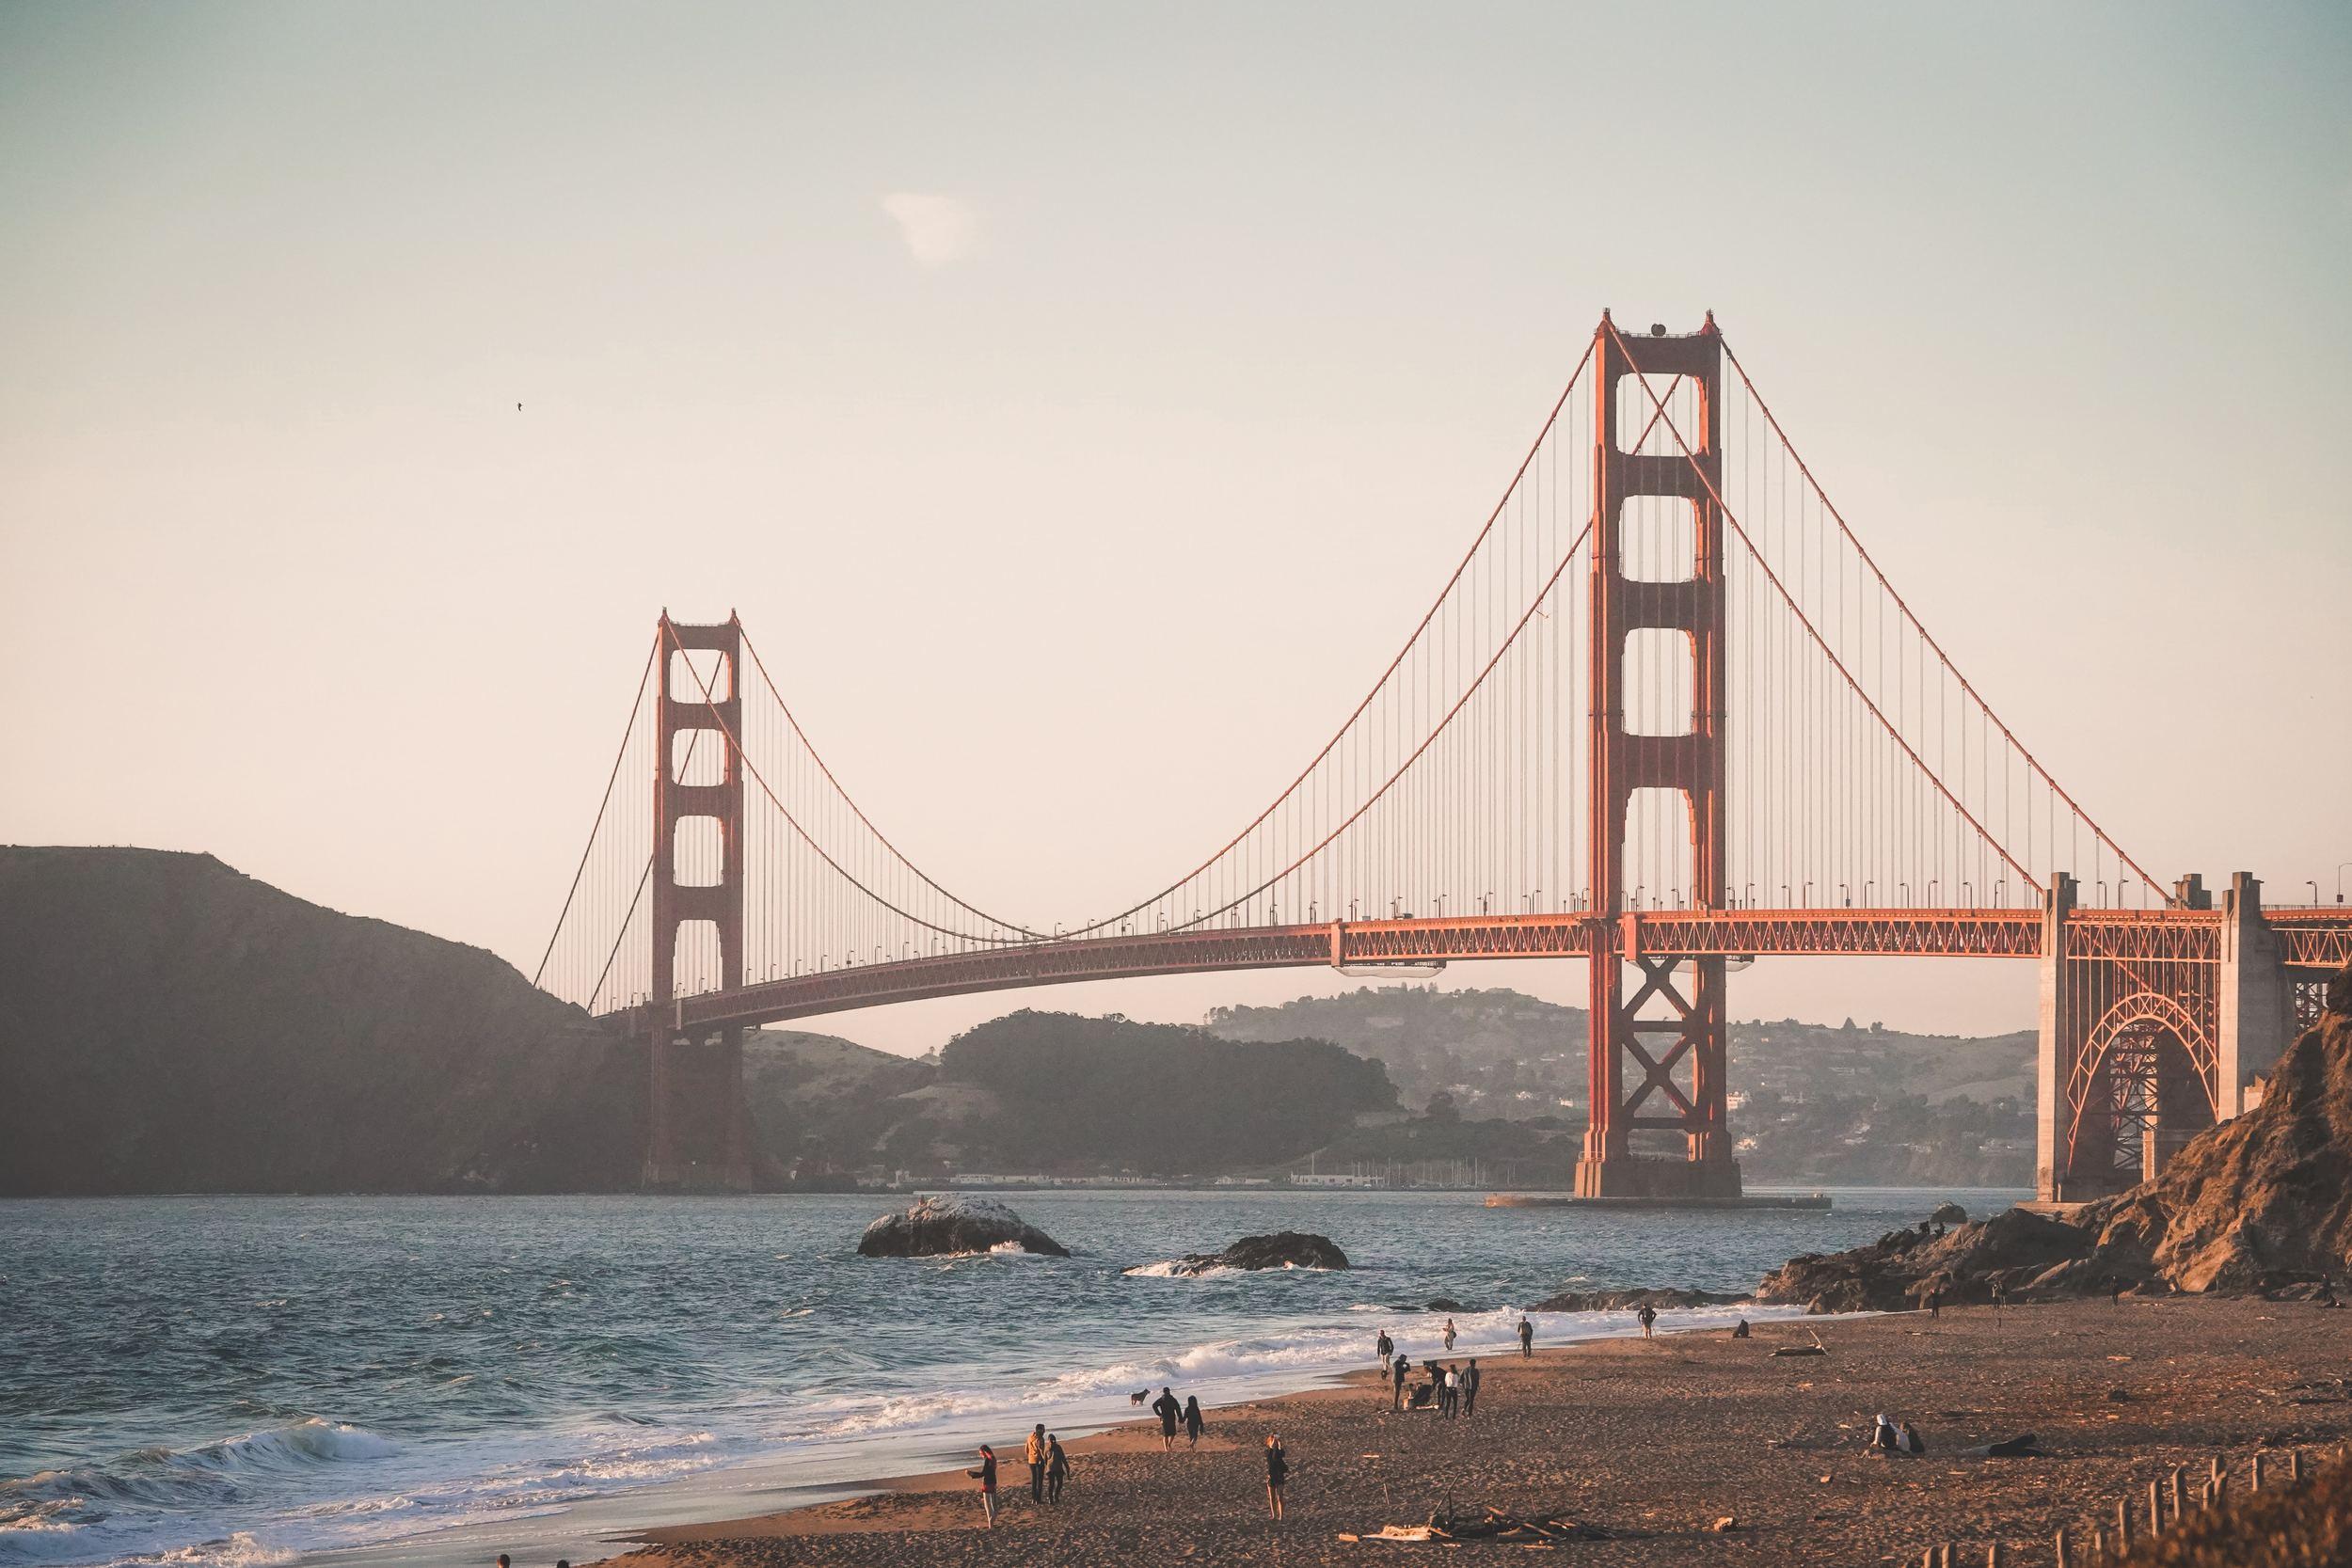 Best Beaches in San Francisco, California - Top 10 Beaches in San Francisco